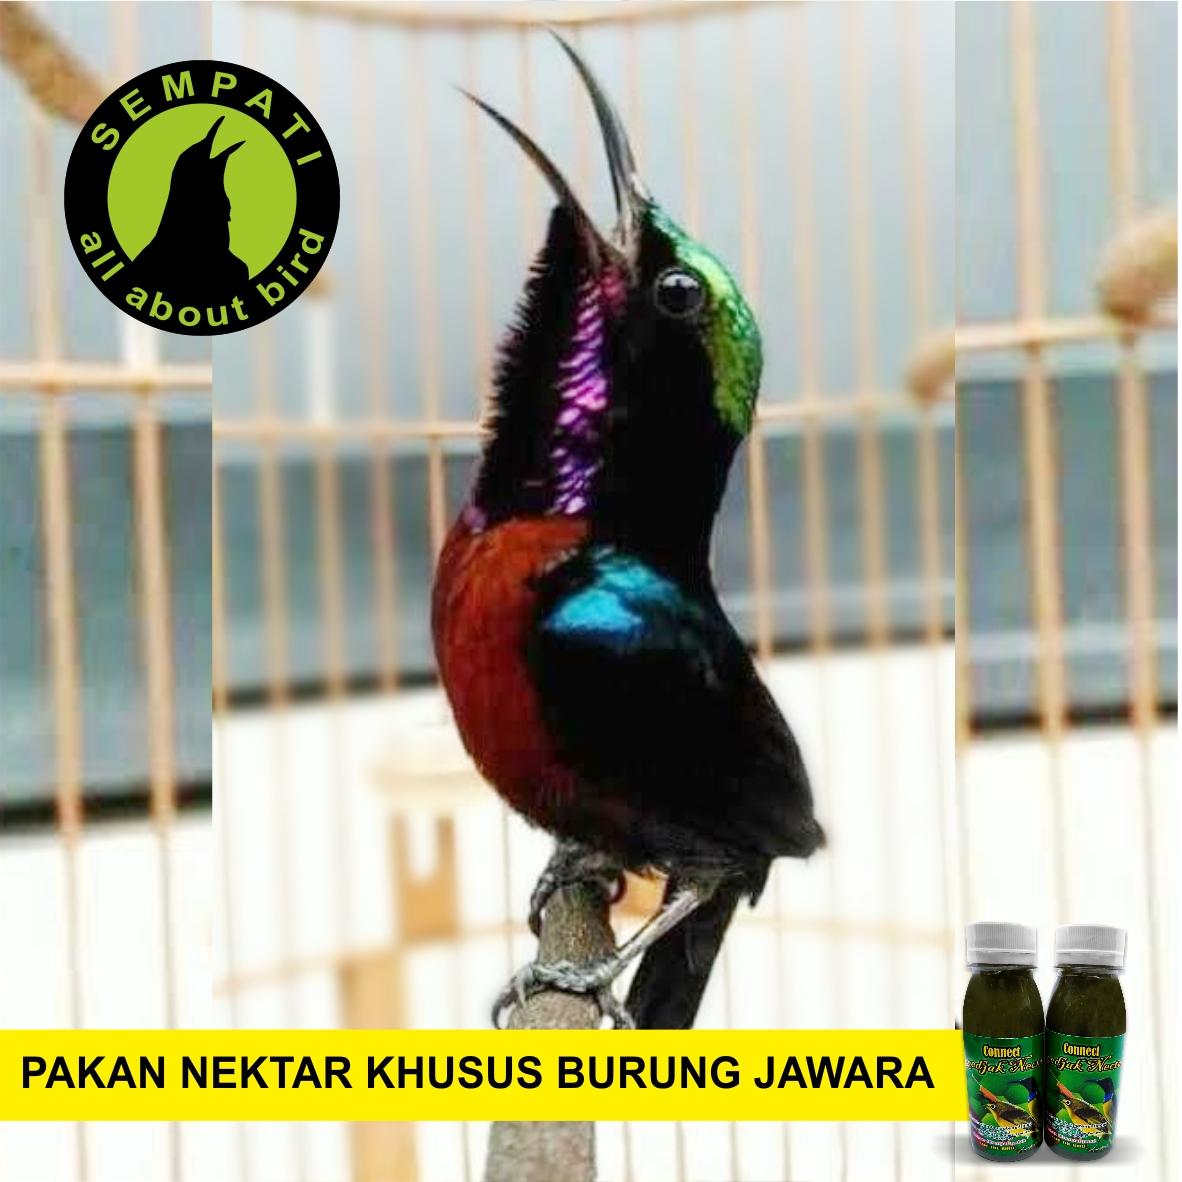 Connect Roedjak Nectar Rudjak Rujak Nektar Pakan Makanan Minum Minuman Burung Pleci Kolibri Cucak Kapas Tembak Colibri Anti Kurus Nyilet Botak Mencret Macet Lesu Rjknbd Sempati Bird Shop